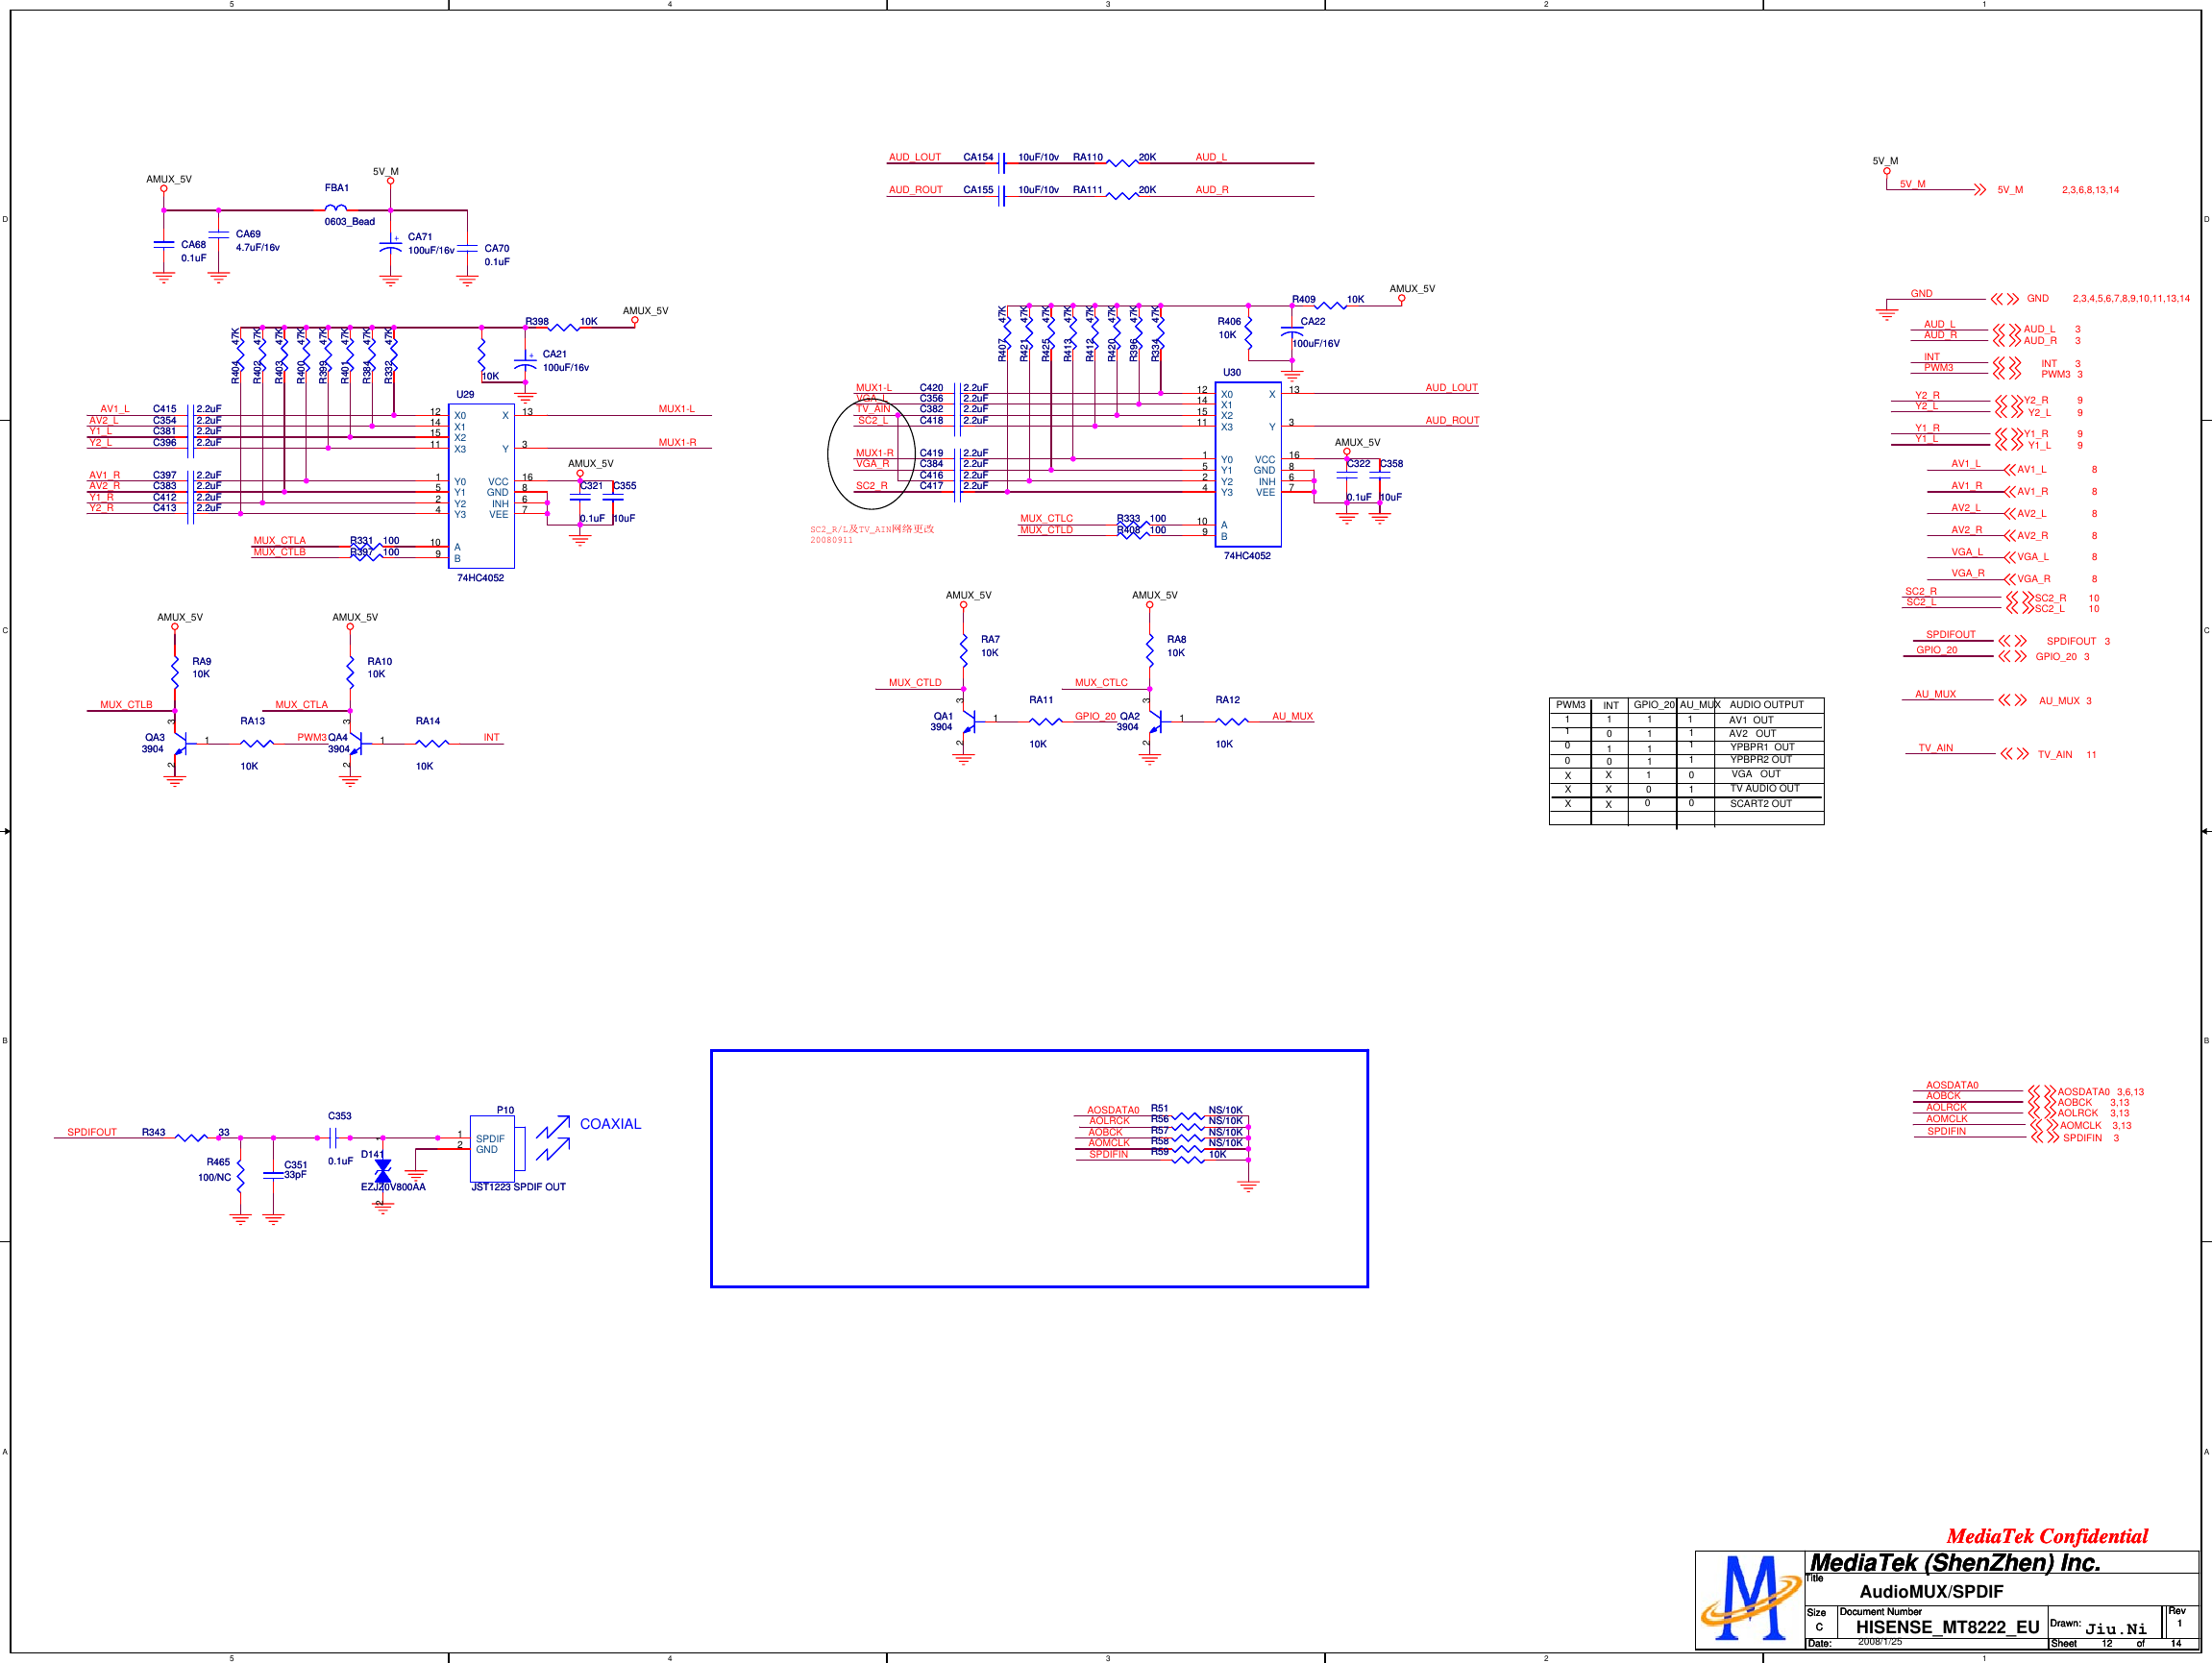 Hisense Lcd32V86 Users Manual 维修手册